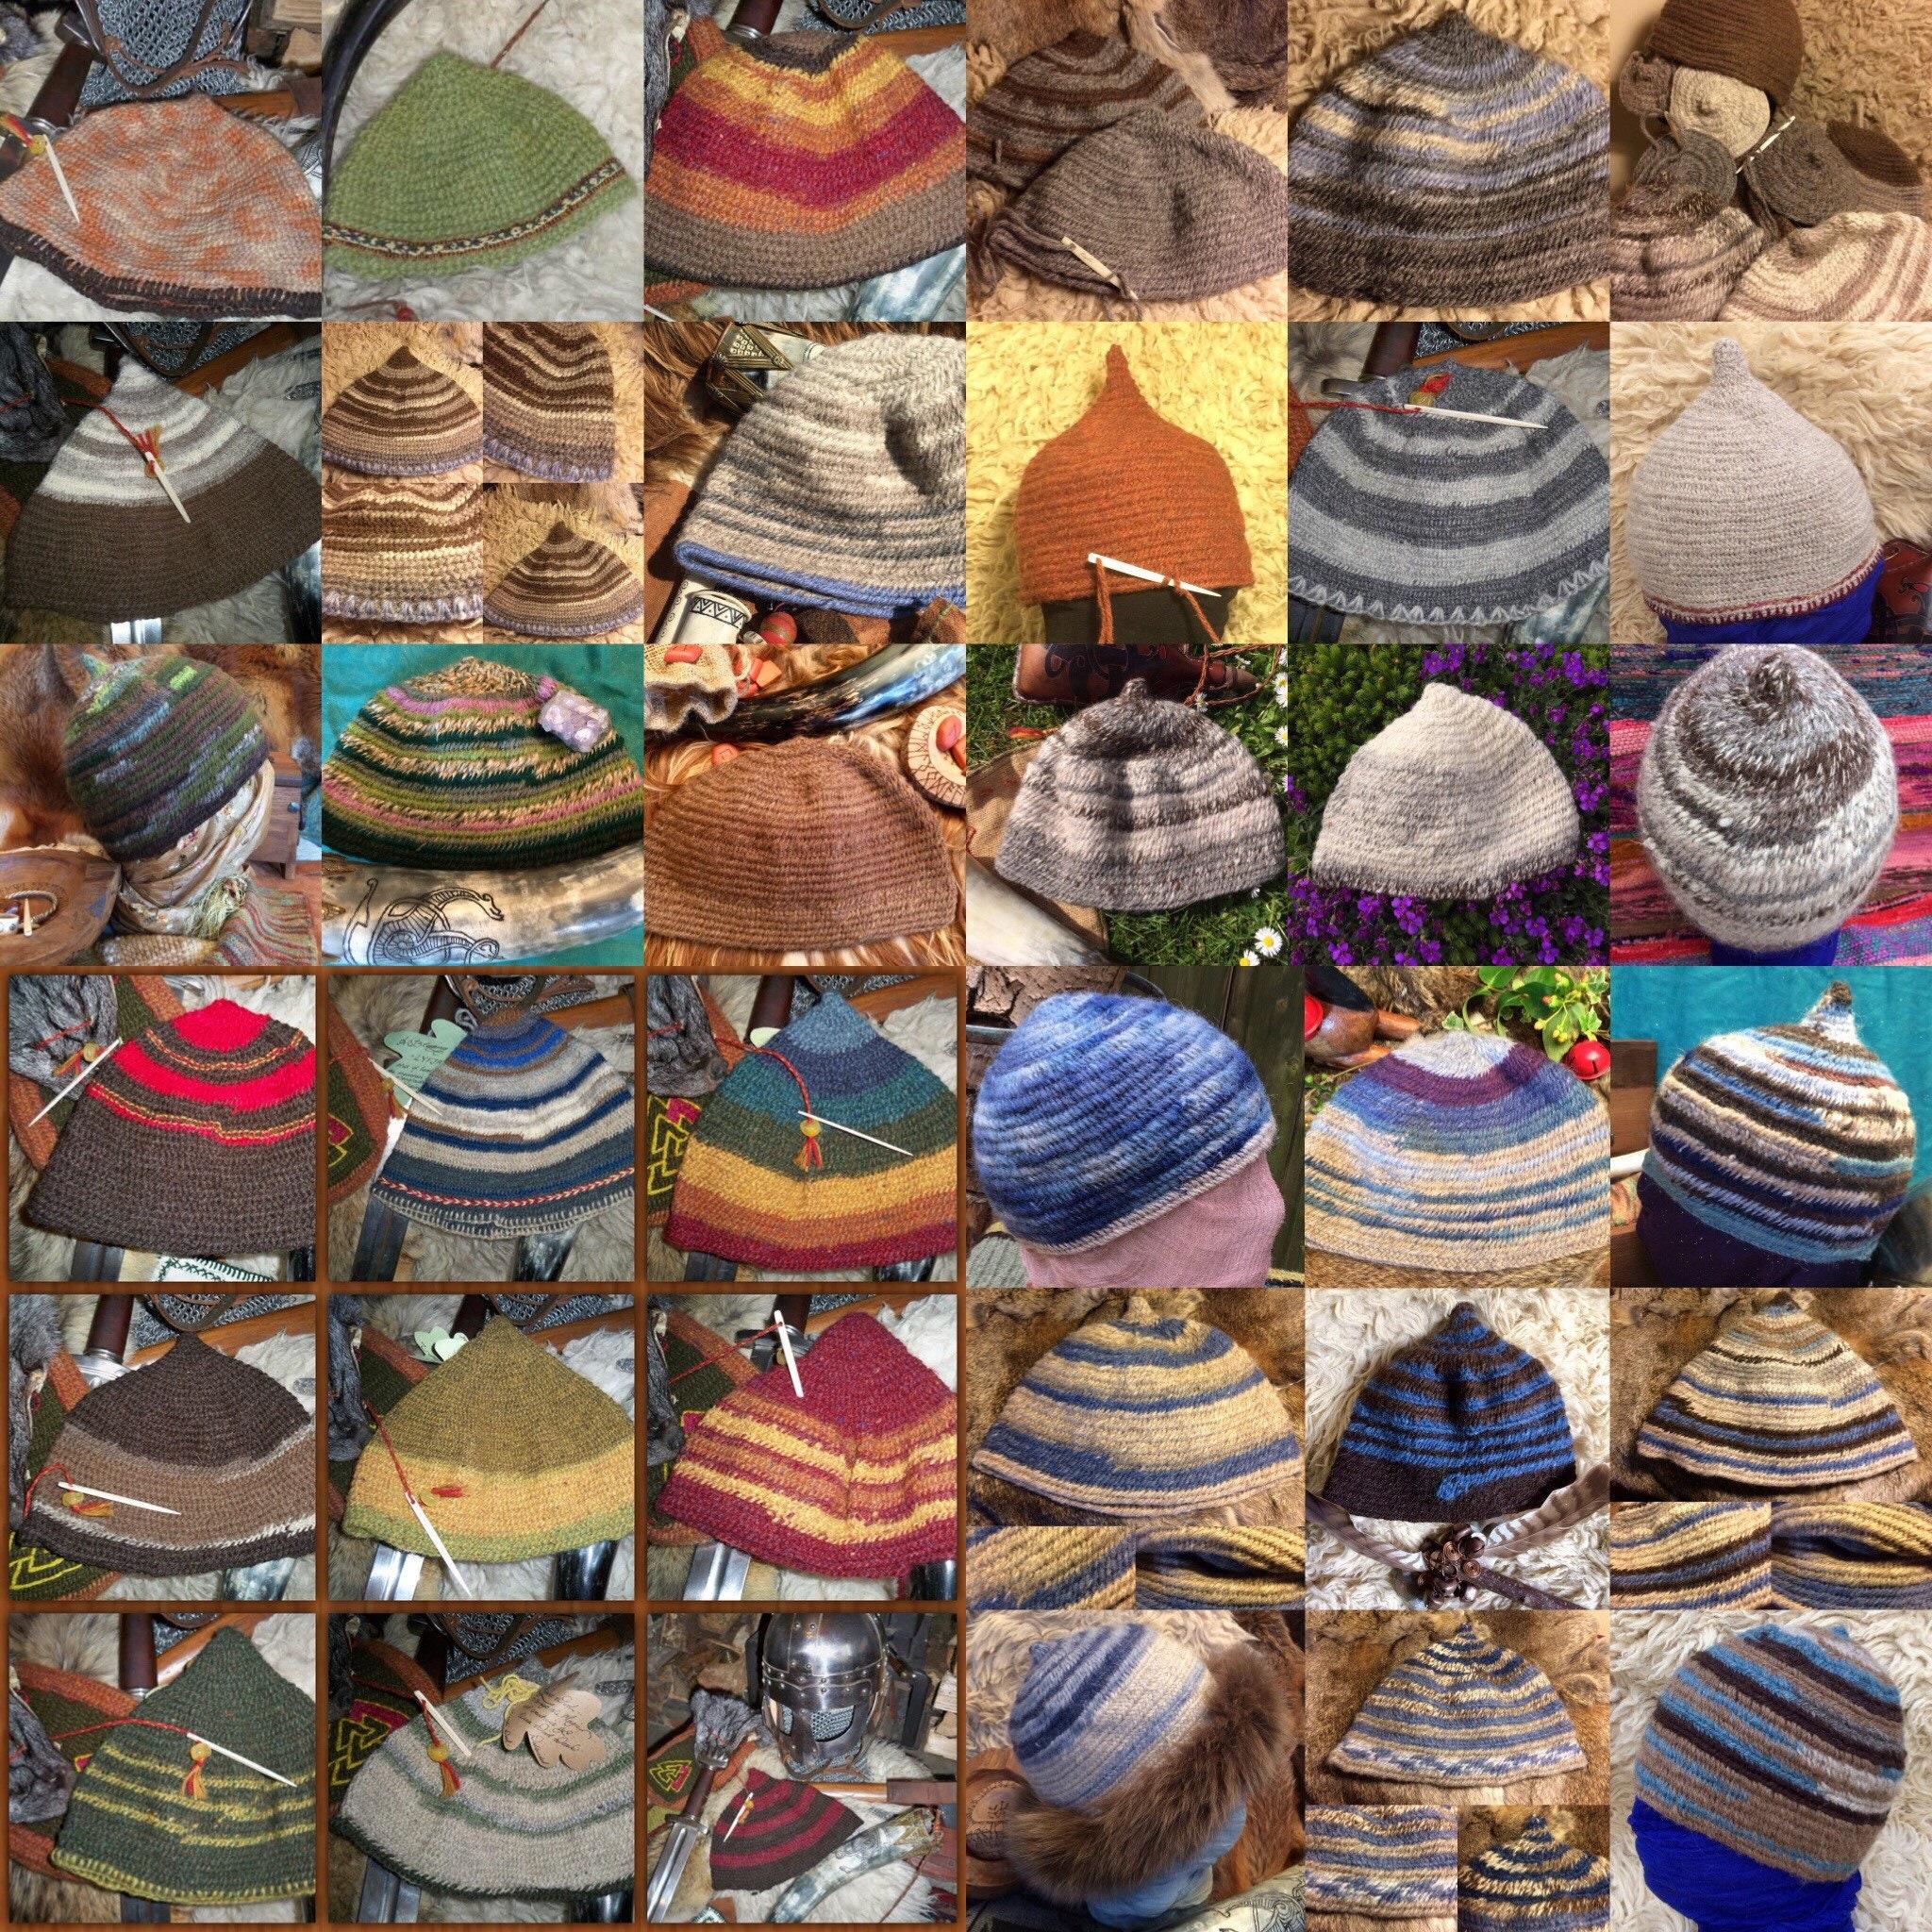 ee3ae7133db Viking wool handmade Nålebinding hats in quality rare breed sheep wools.  gallery photo gallery photo gallery photo ...